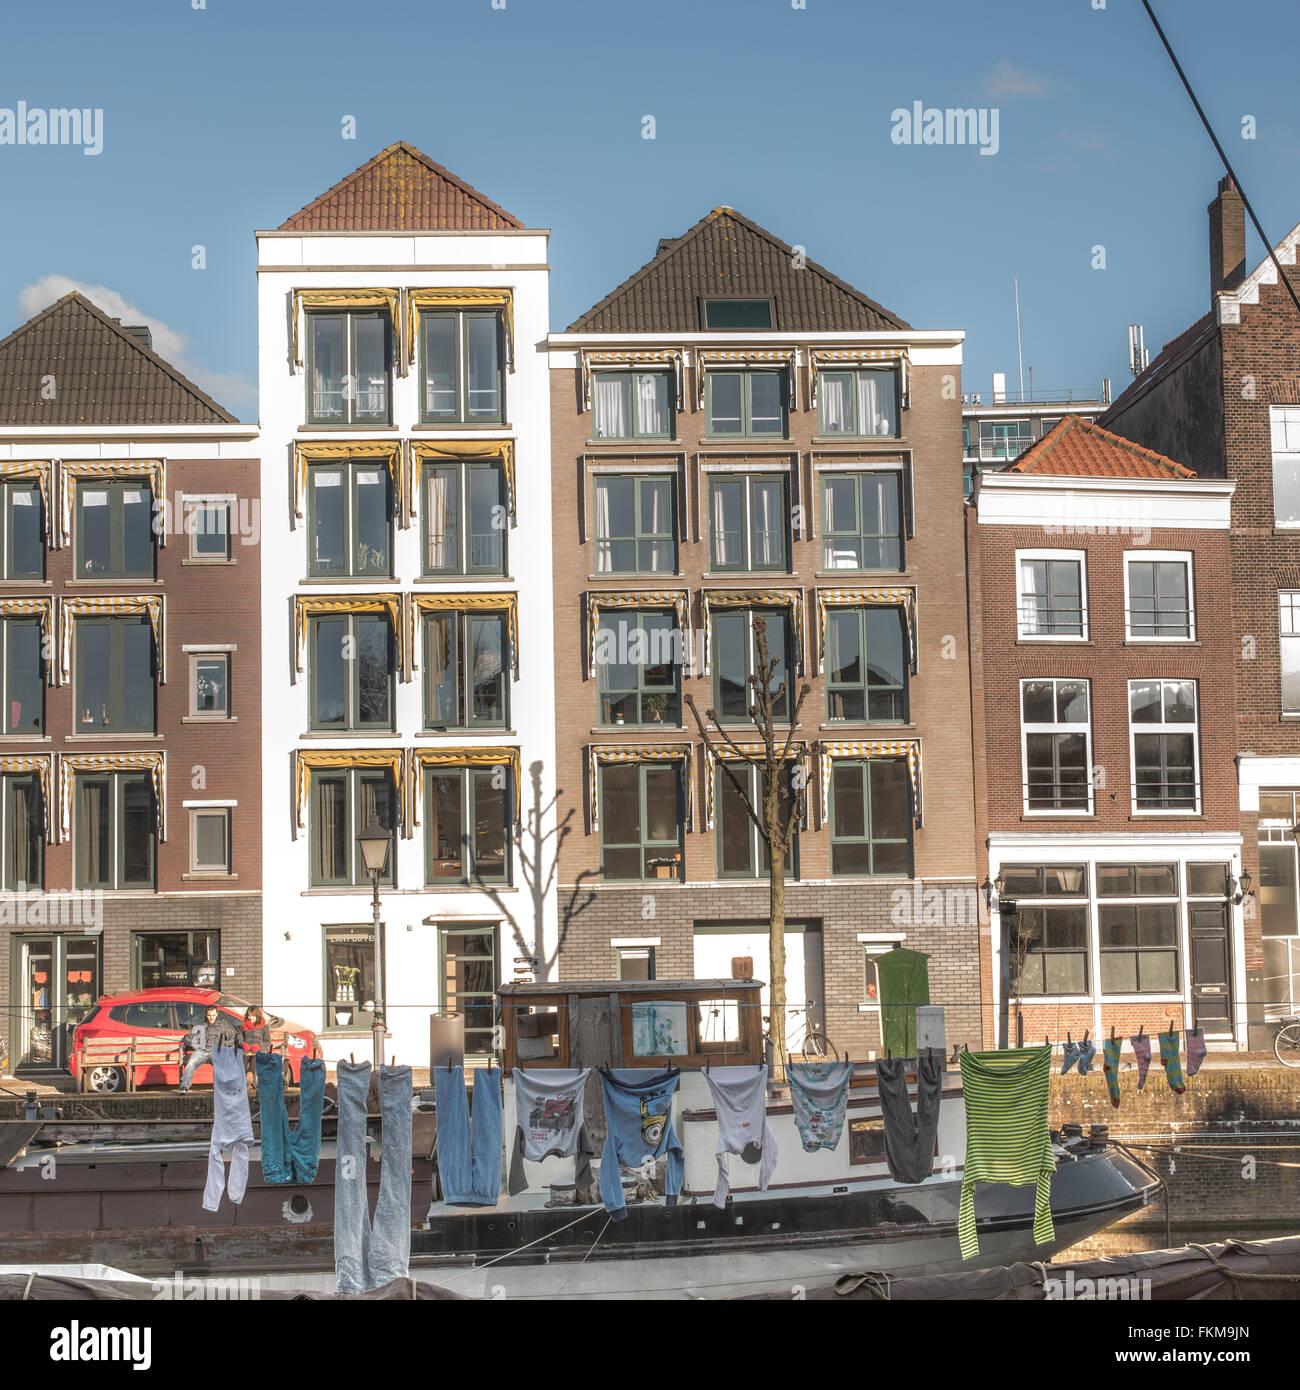 Historical Neighbourhood in Rotterdam, Netherlands Stock Photo